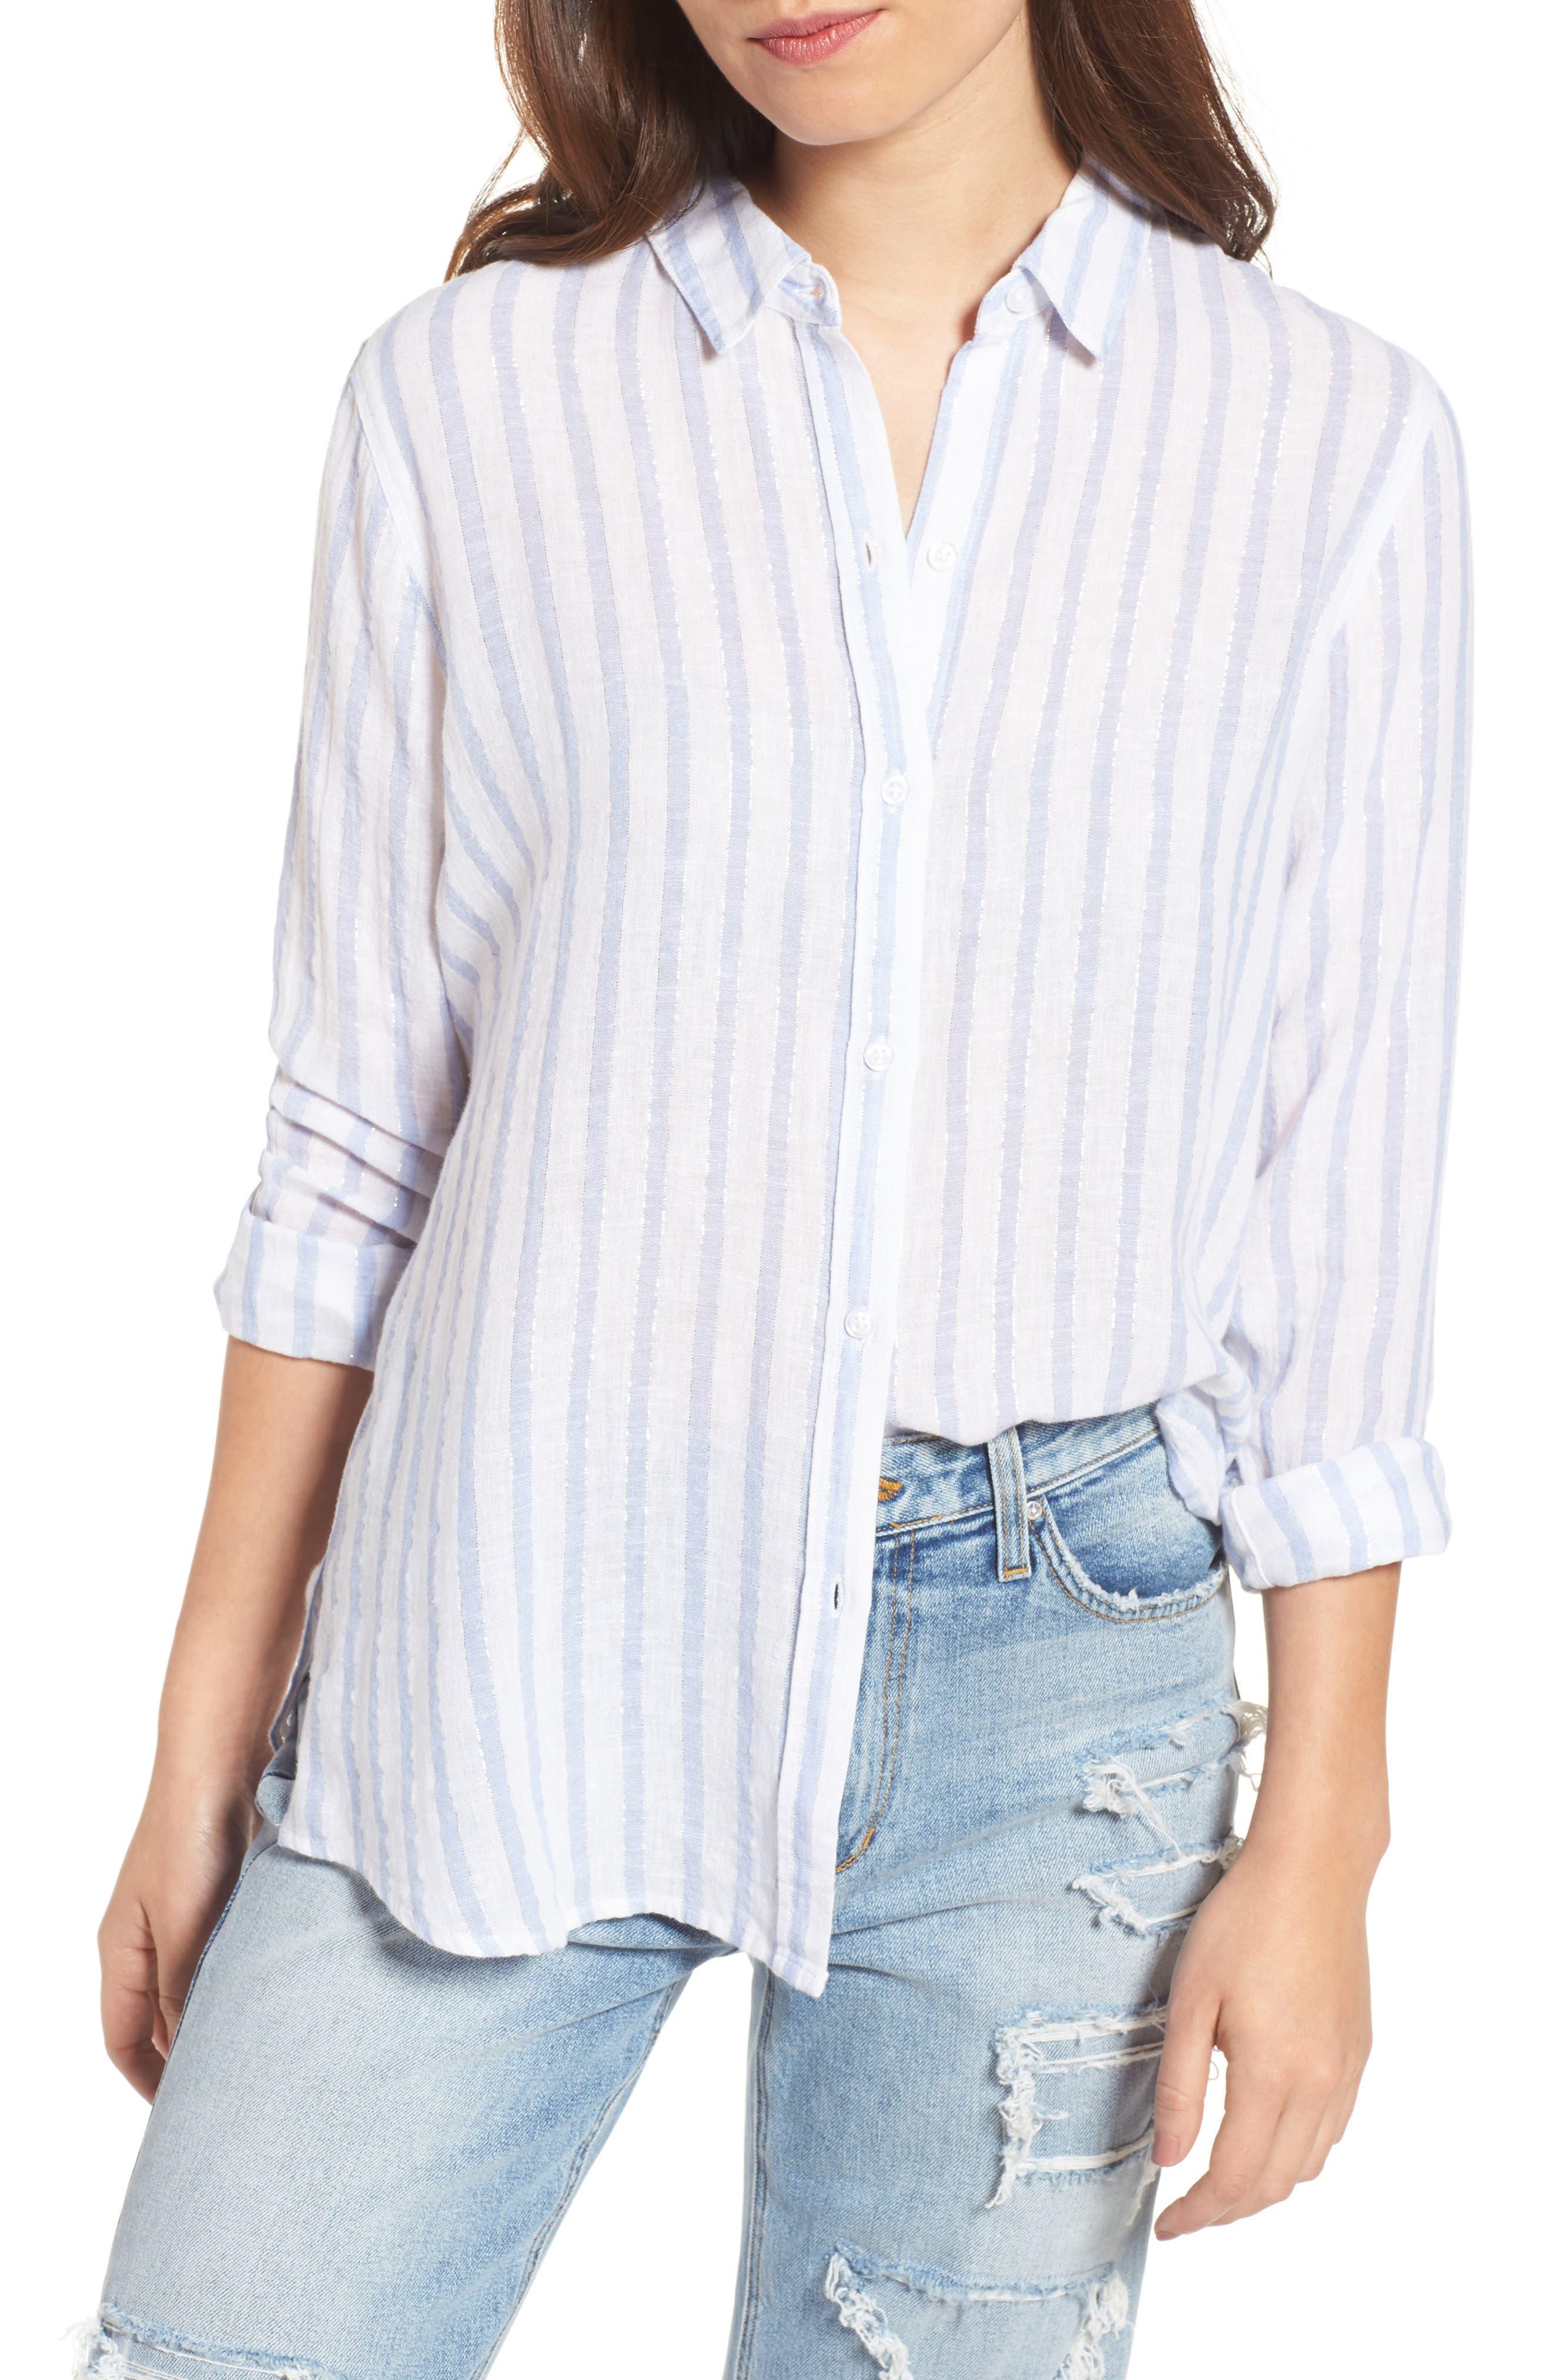 Main Image - Rails Sydney Vertical Shimmer Stripe Linen Blend Shirt